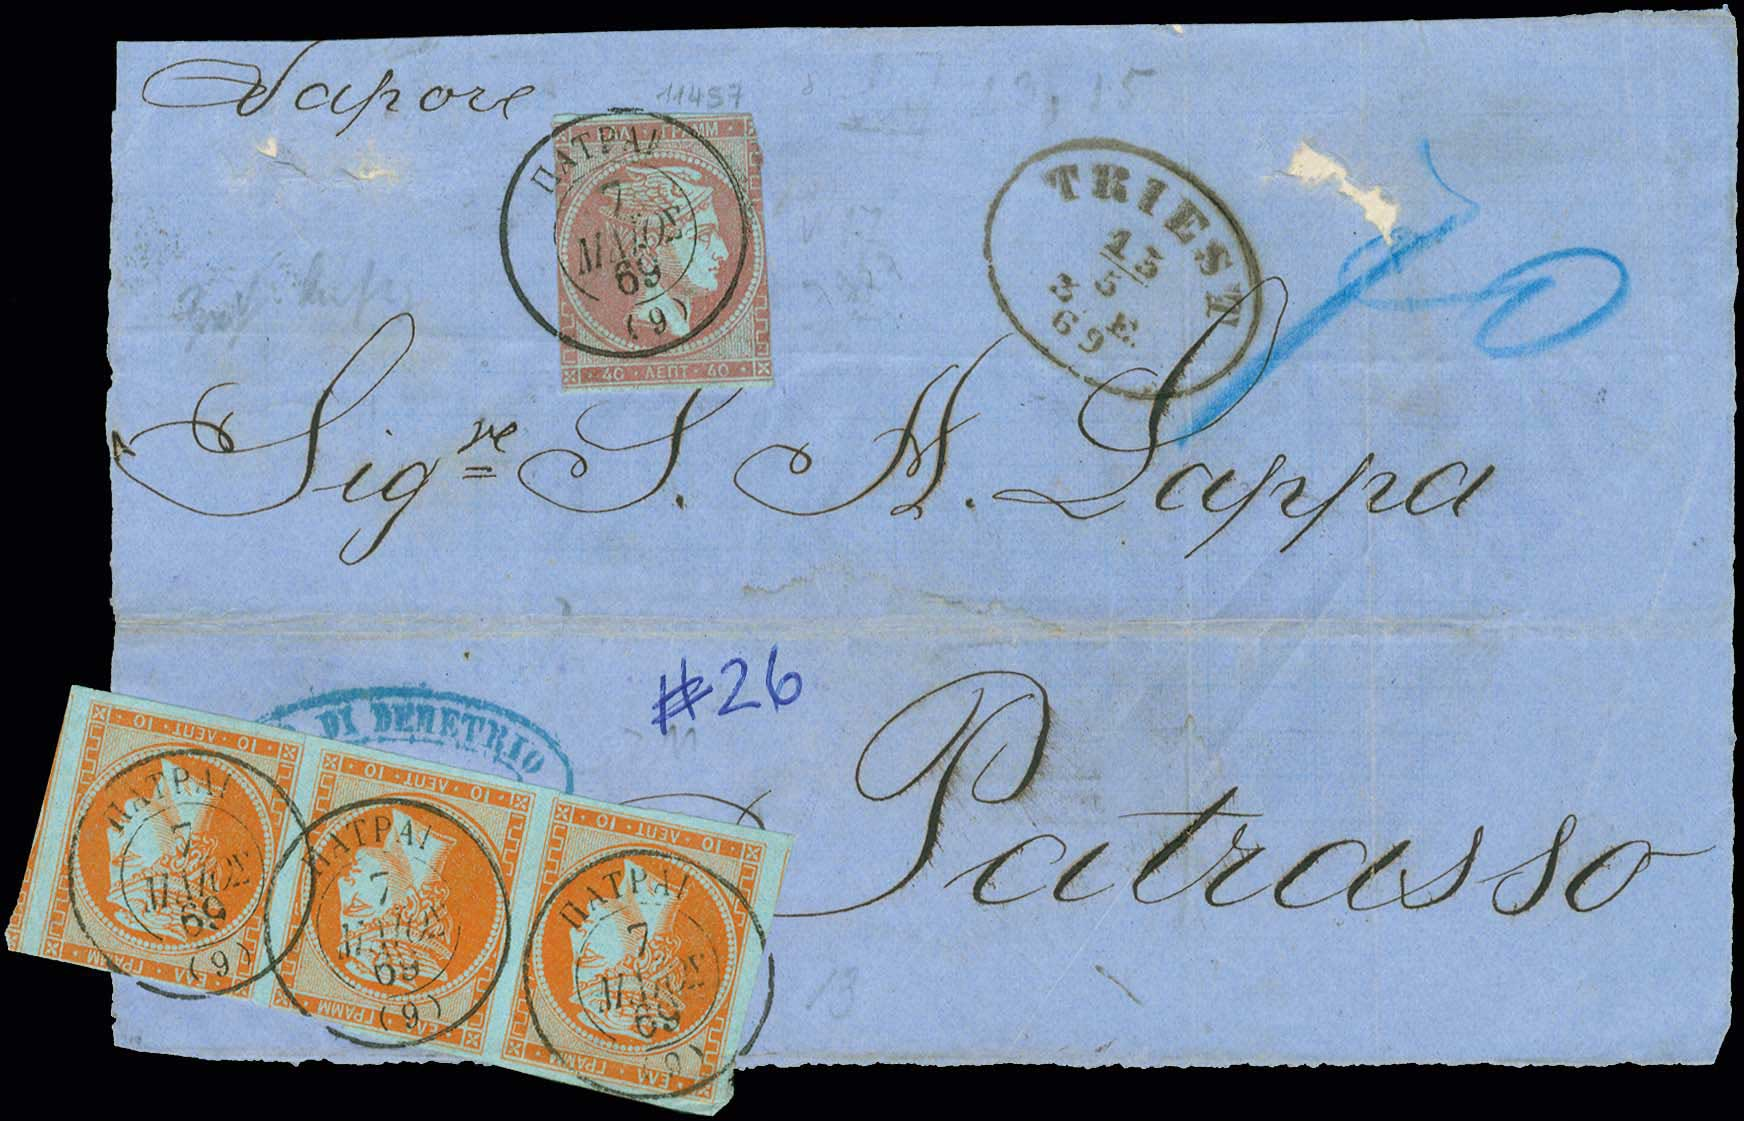 Lot 153 - -  LARGE HERMES HEAD 1862/67 consecutive athens printings -  A. Karamitsos Public & Live Internet Auction 683